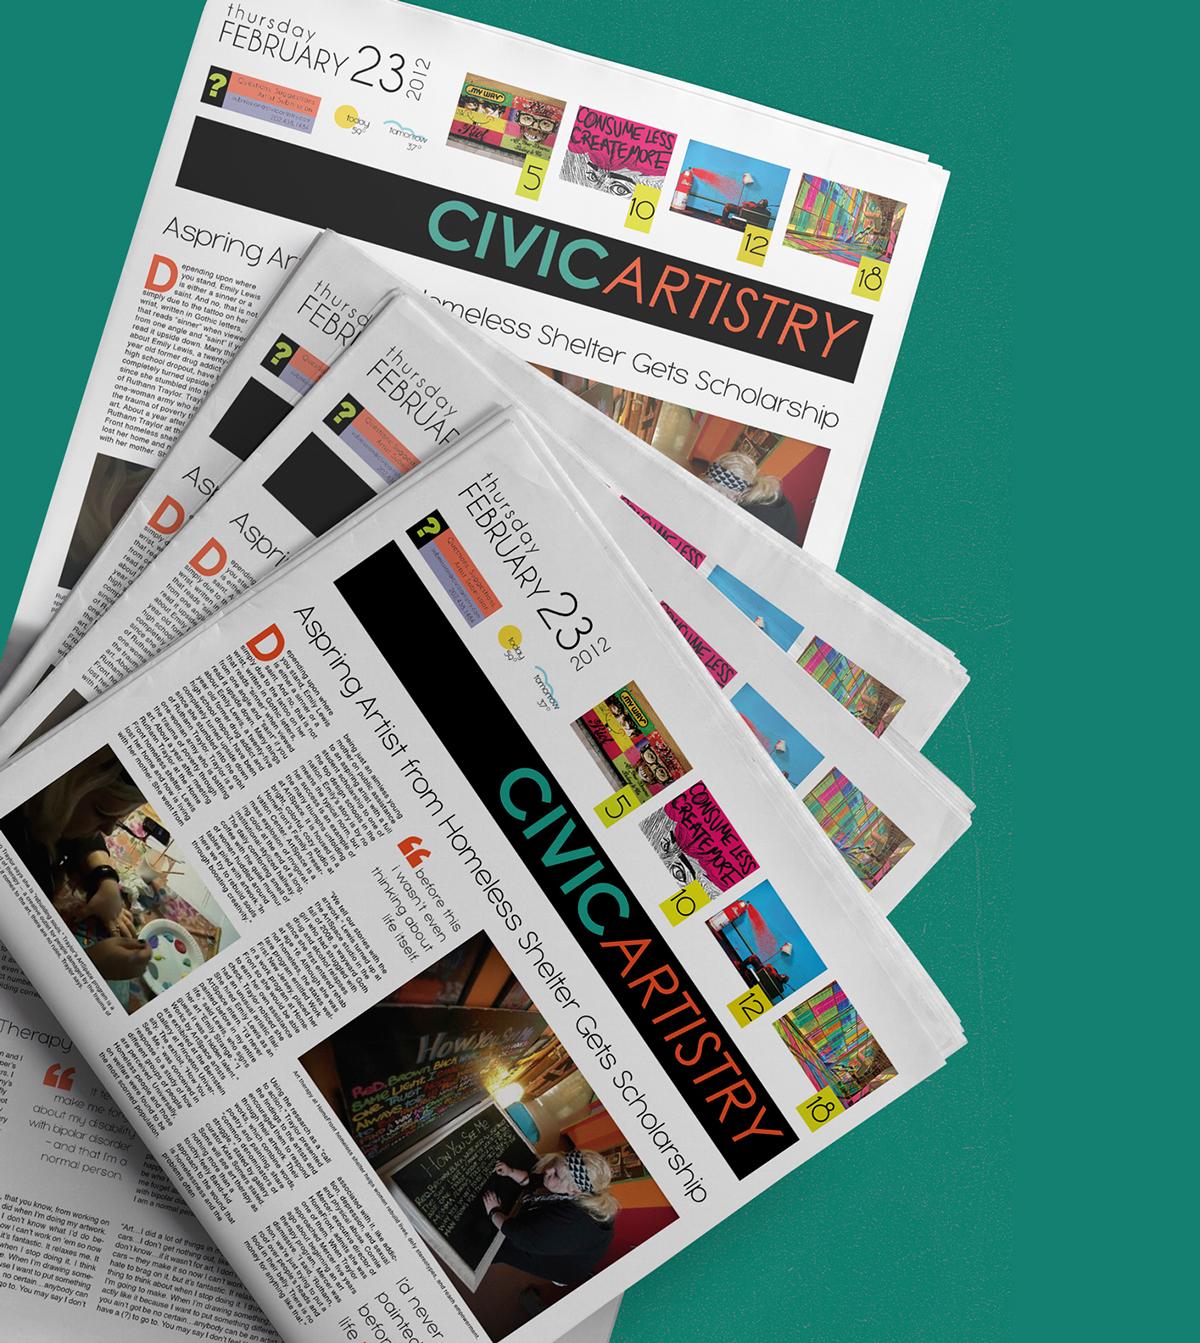 aliana grace bailey art design newspaper civic artistry graphic design.jpg